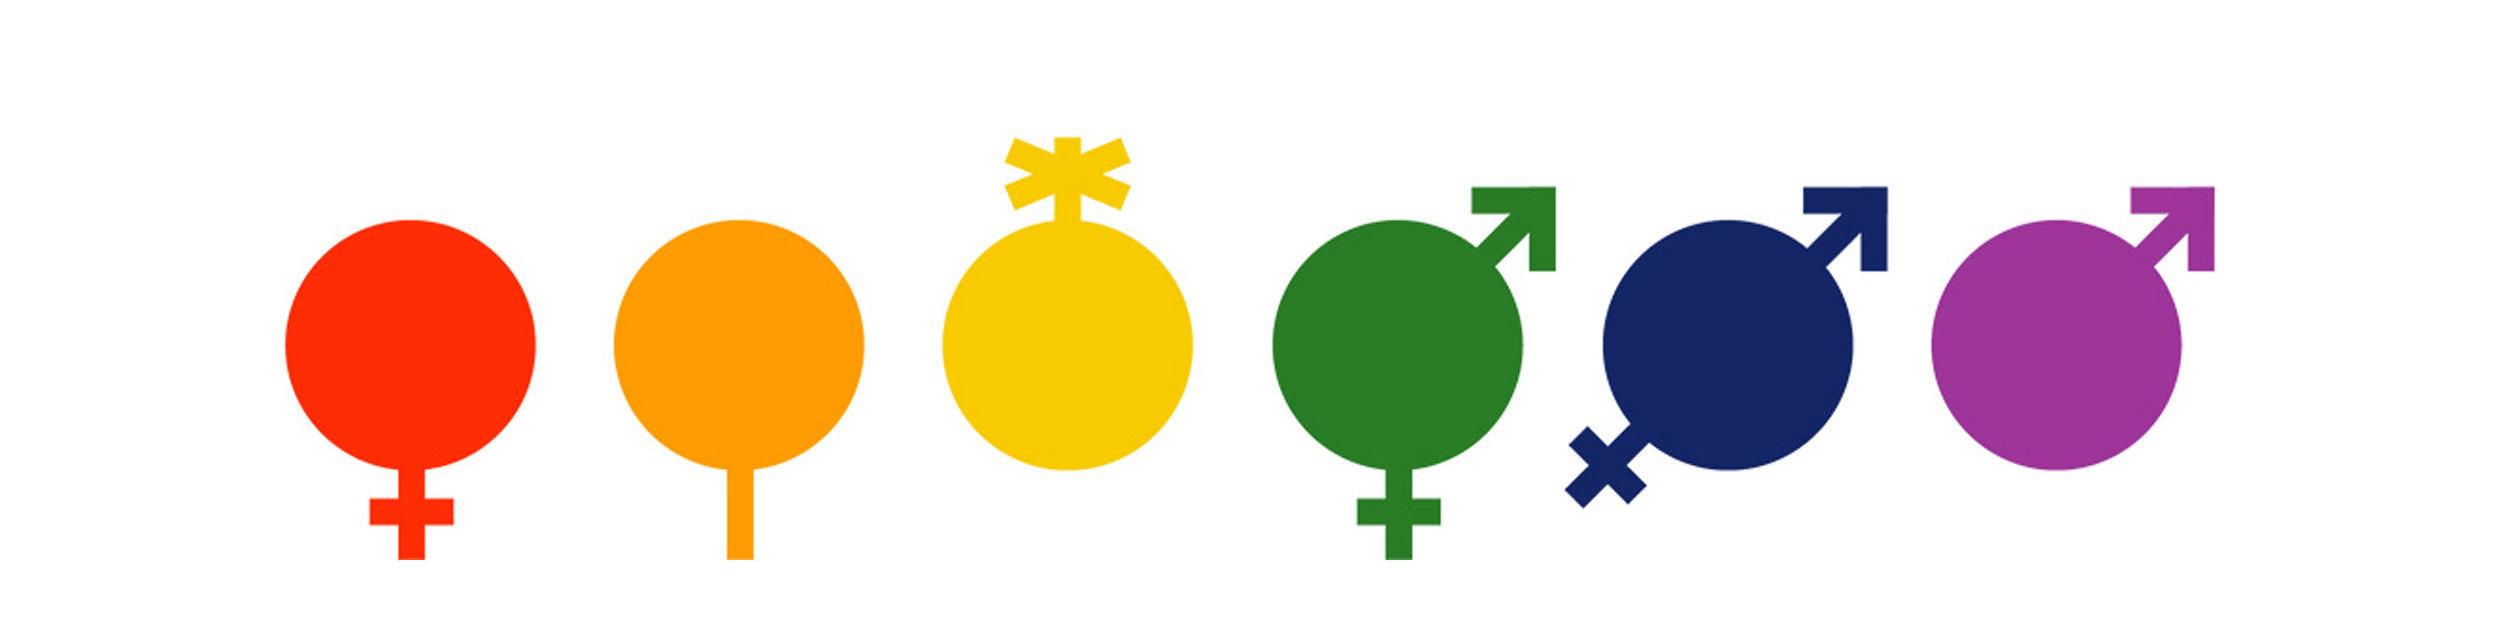 Как трансы и гендеры меняют английский язык